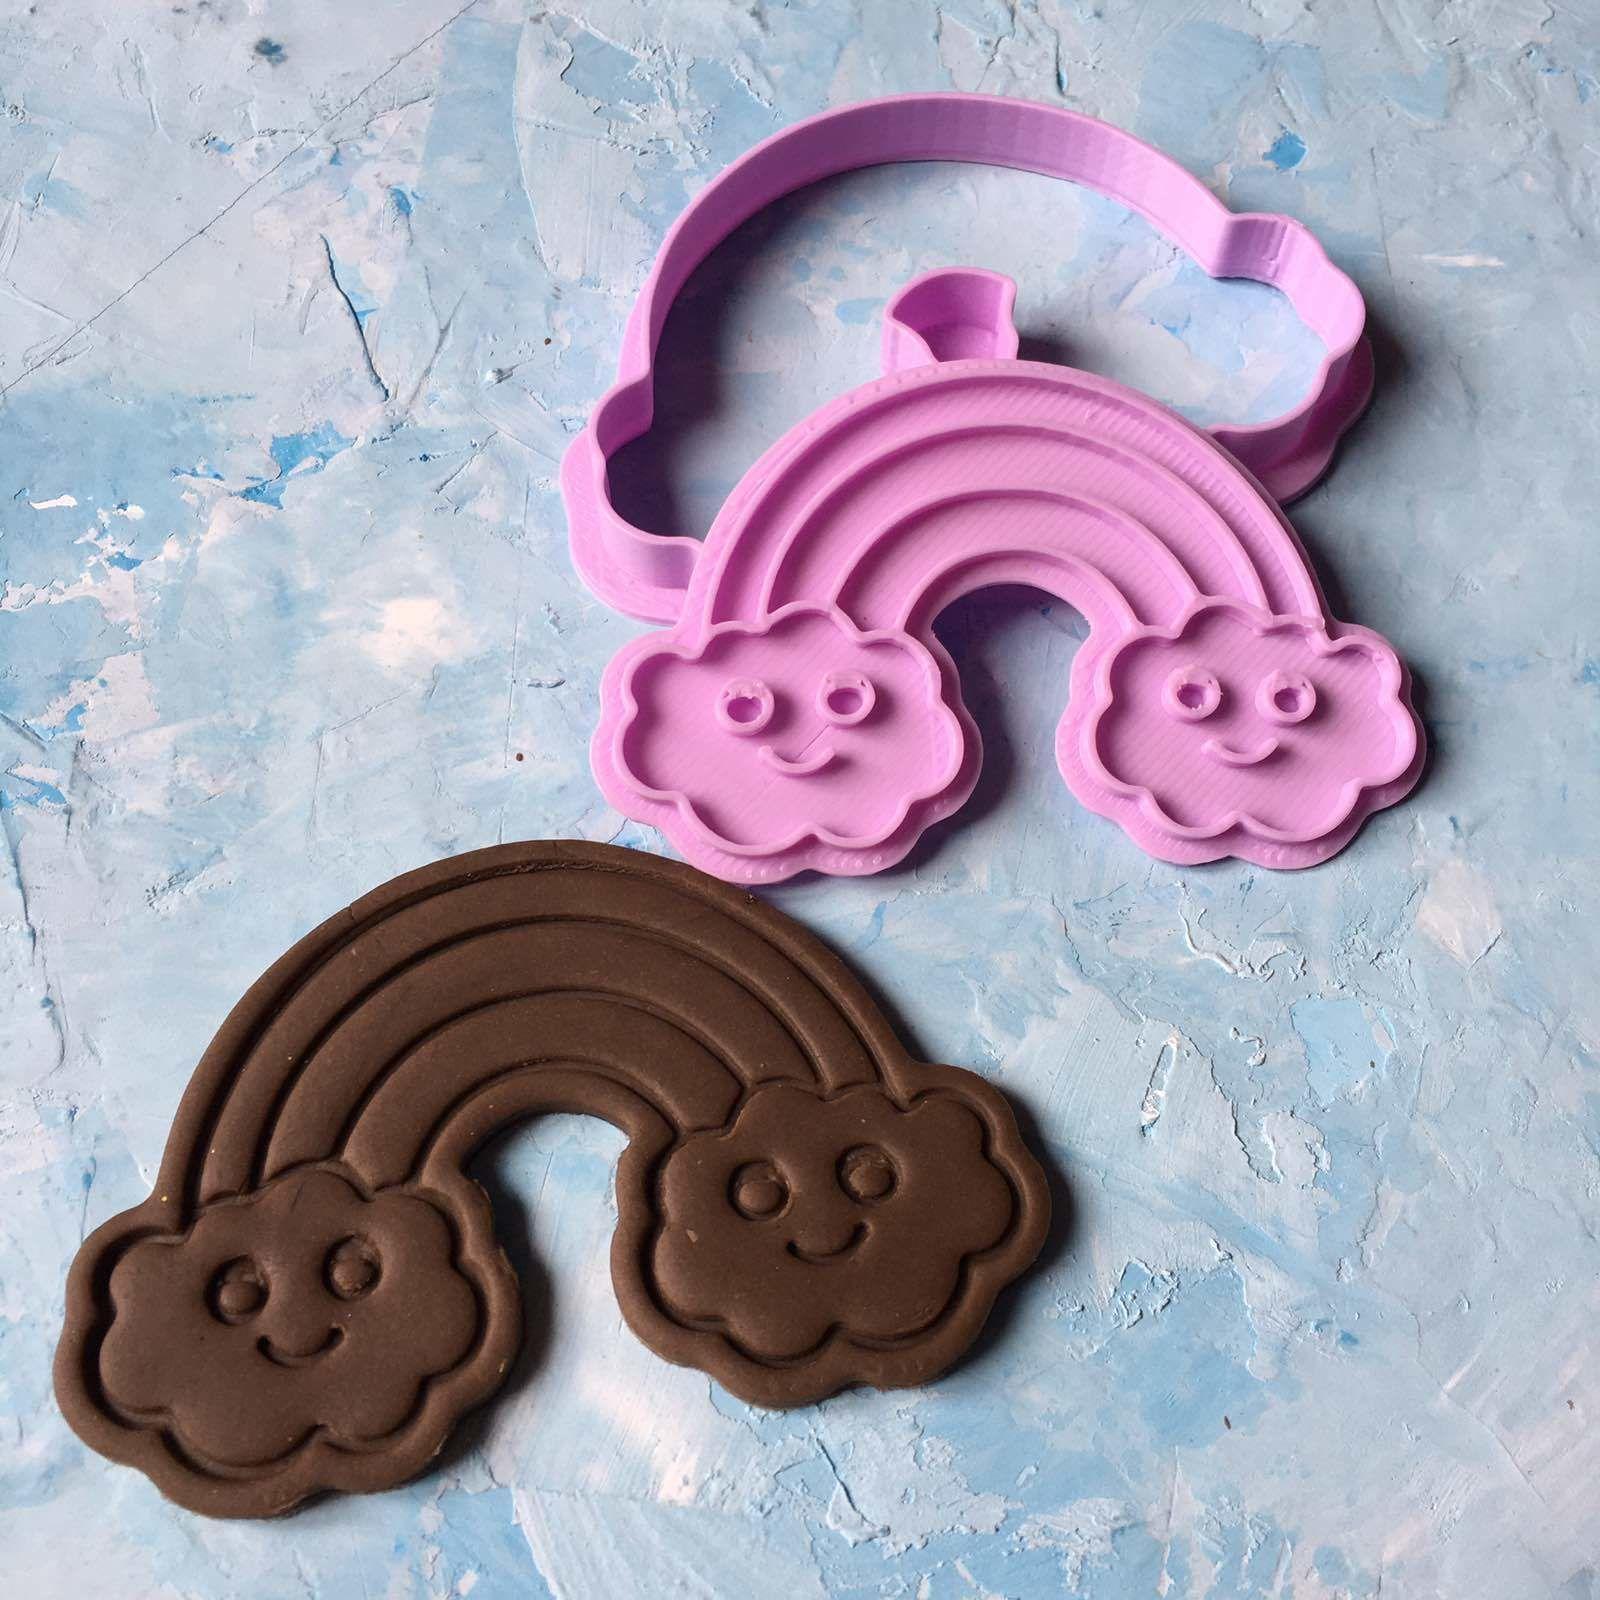 Rainbow cookie cutter stl file 3D print model